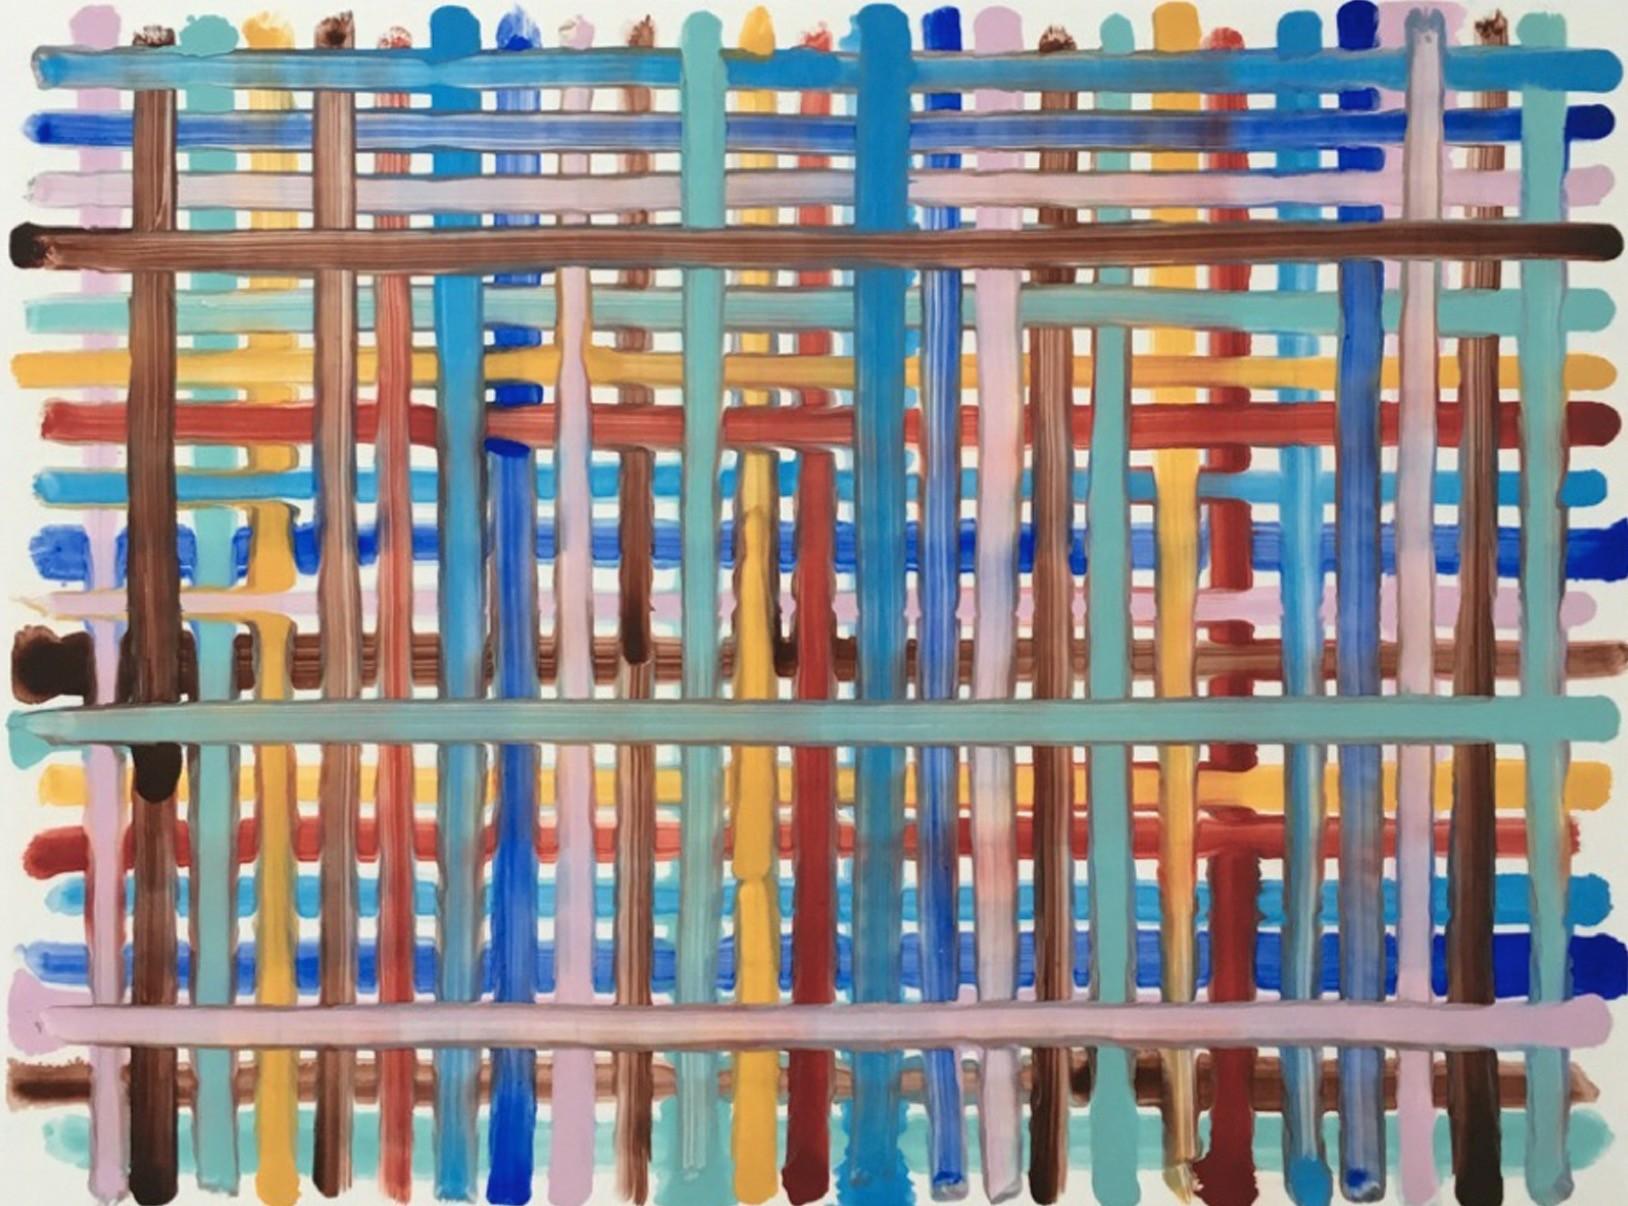 Bernard Frize, u201cMelia-sept,u201d acrylic and resin on canvas, 2017.